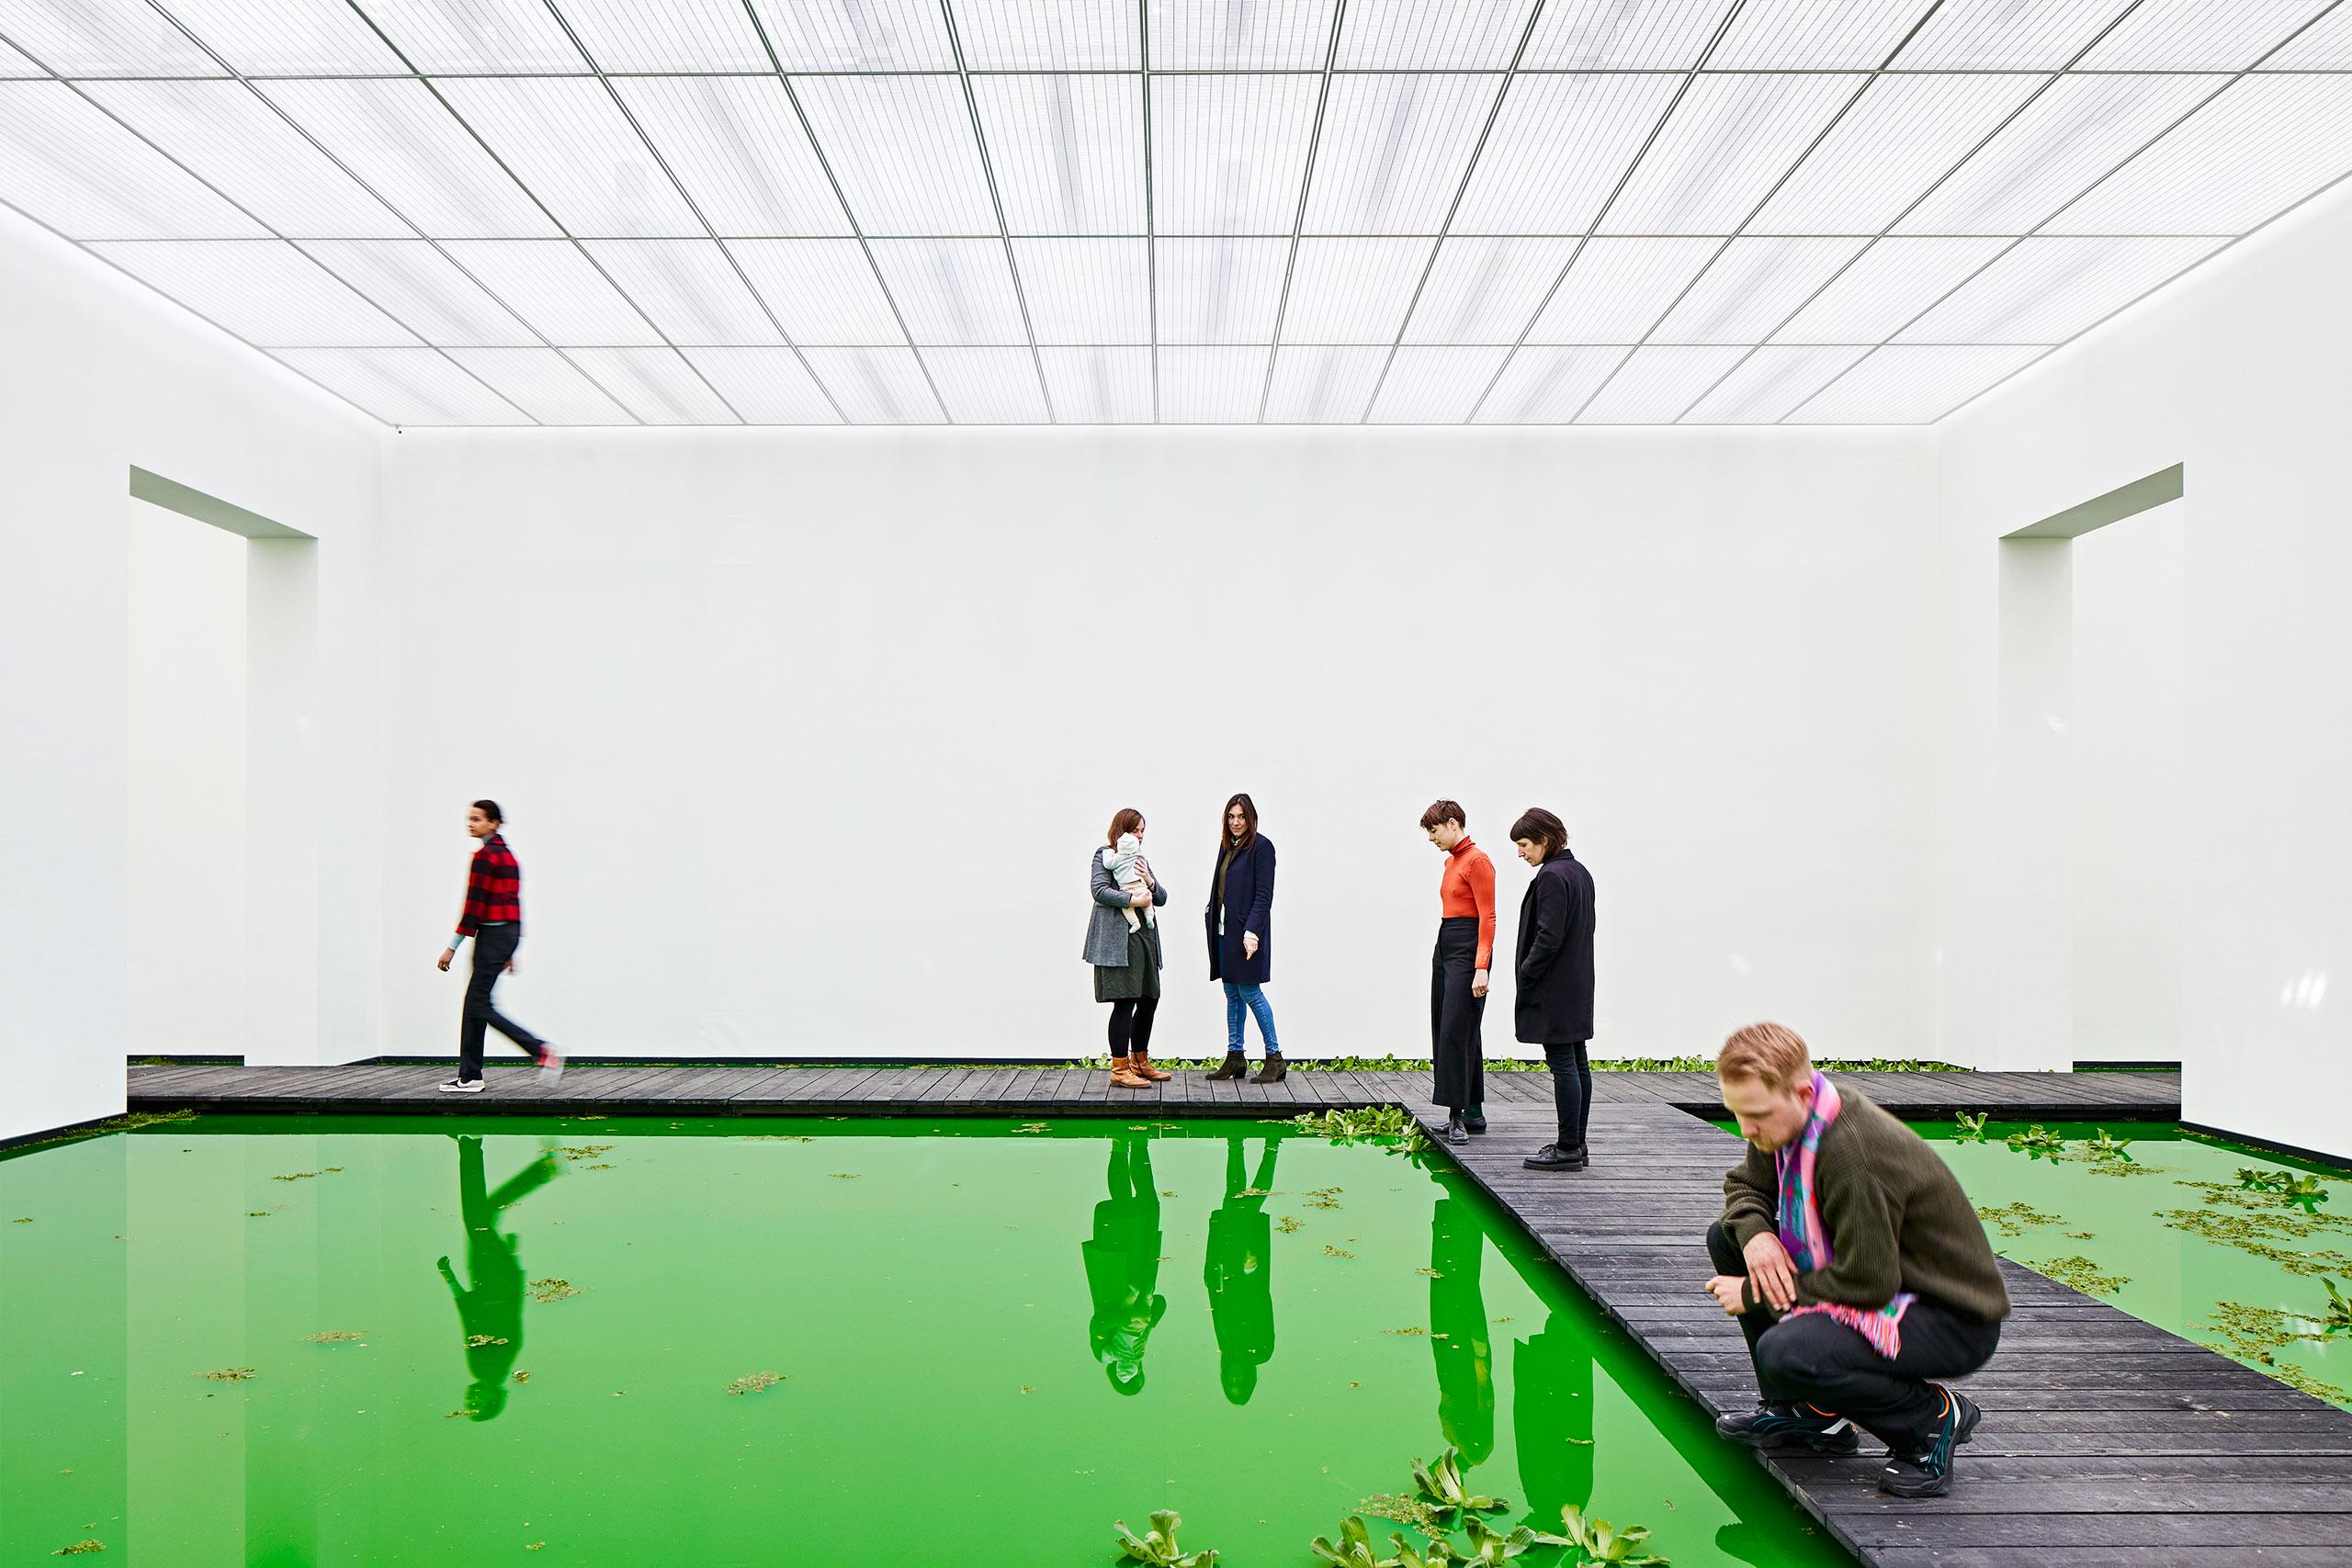 Olafur Eliasson,LIFE, 2021.Installation view: Fondation Beyeler, Riehen/Basel, 2021.Courtesy of the artist; neugerriemschneider, Berlin; Tanya Bonakdar Gallery, New York / Los Angeles © 2021 Olafur Eliasson. Photo: Mark Niedermann